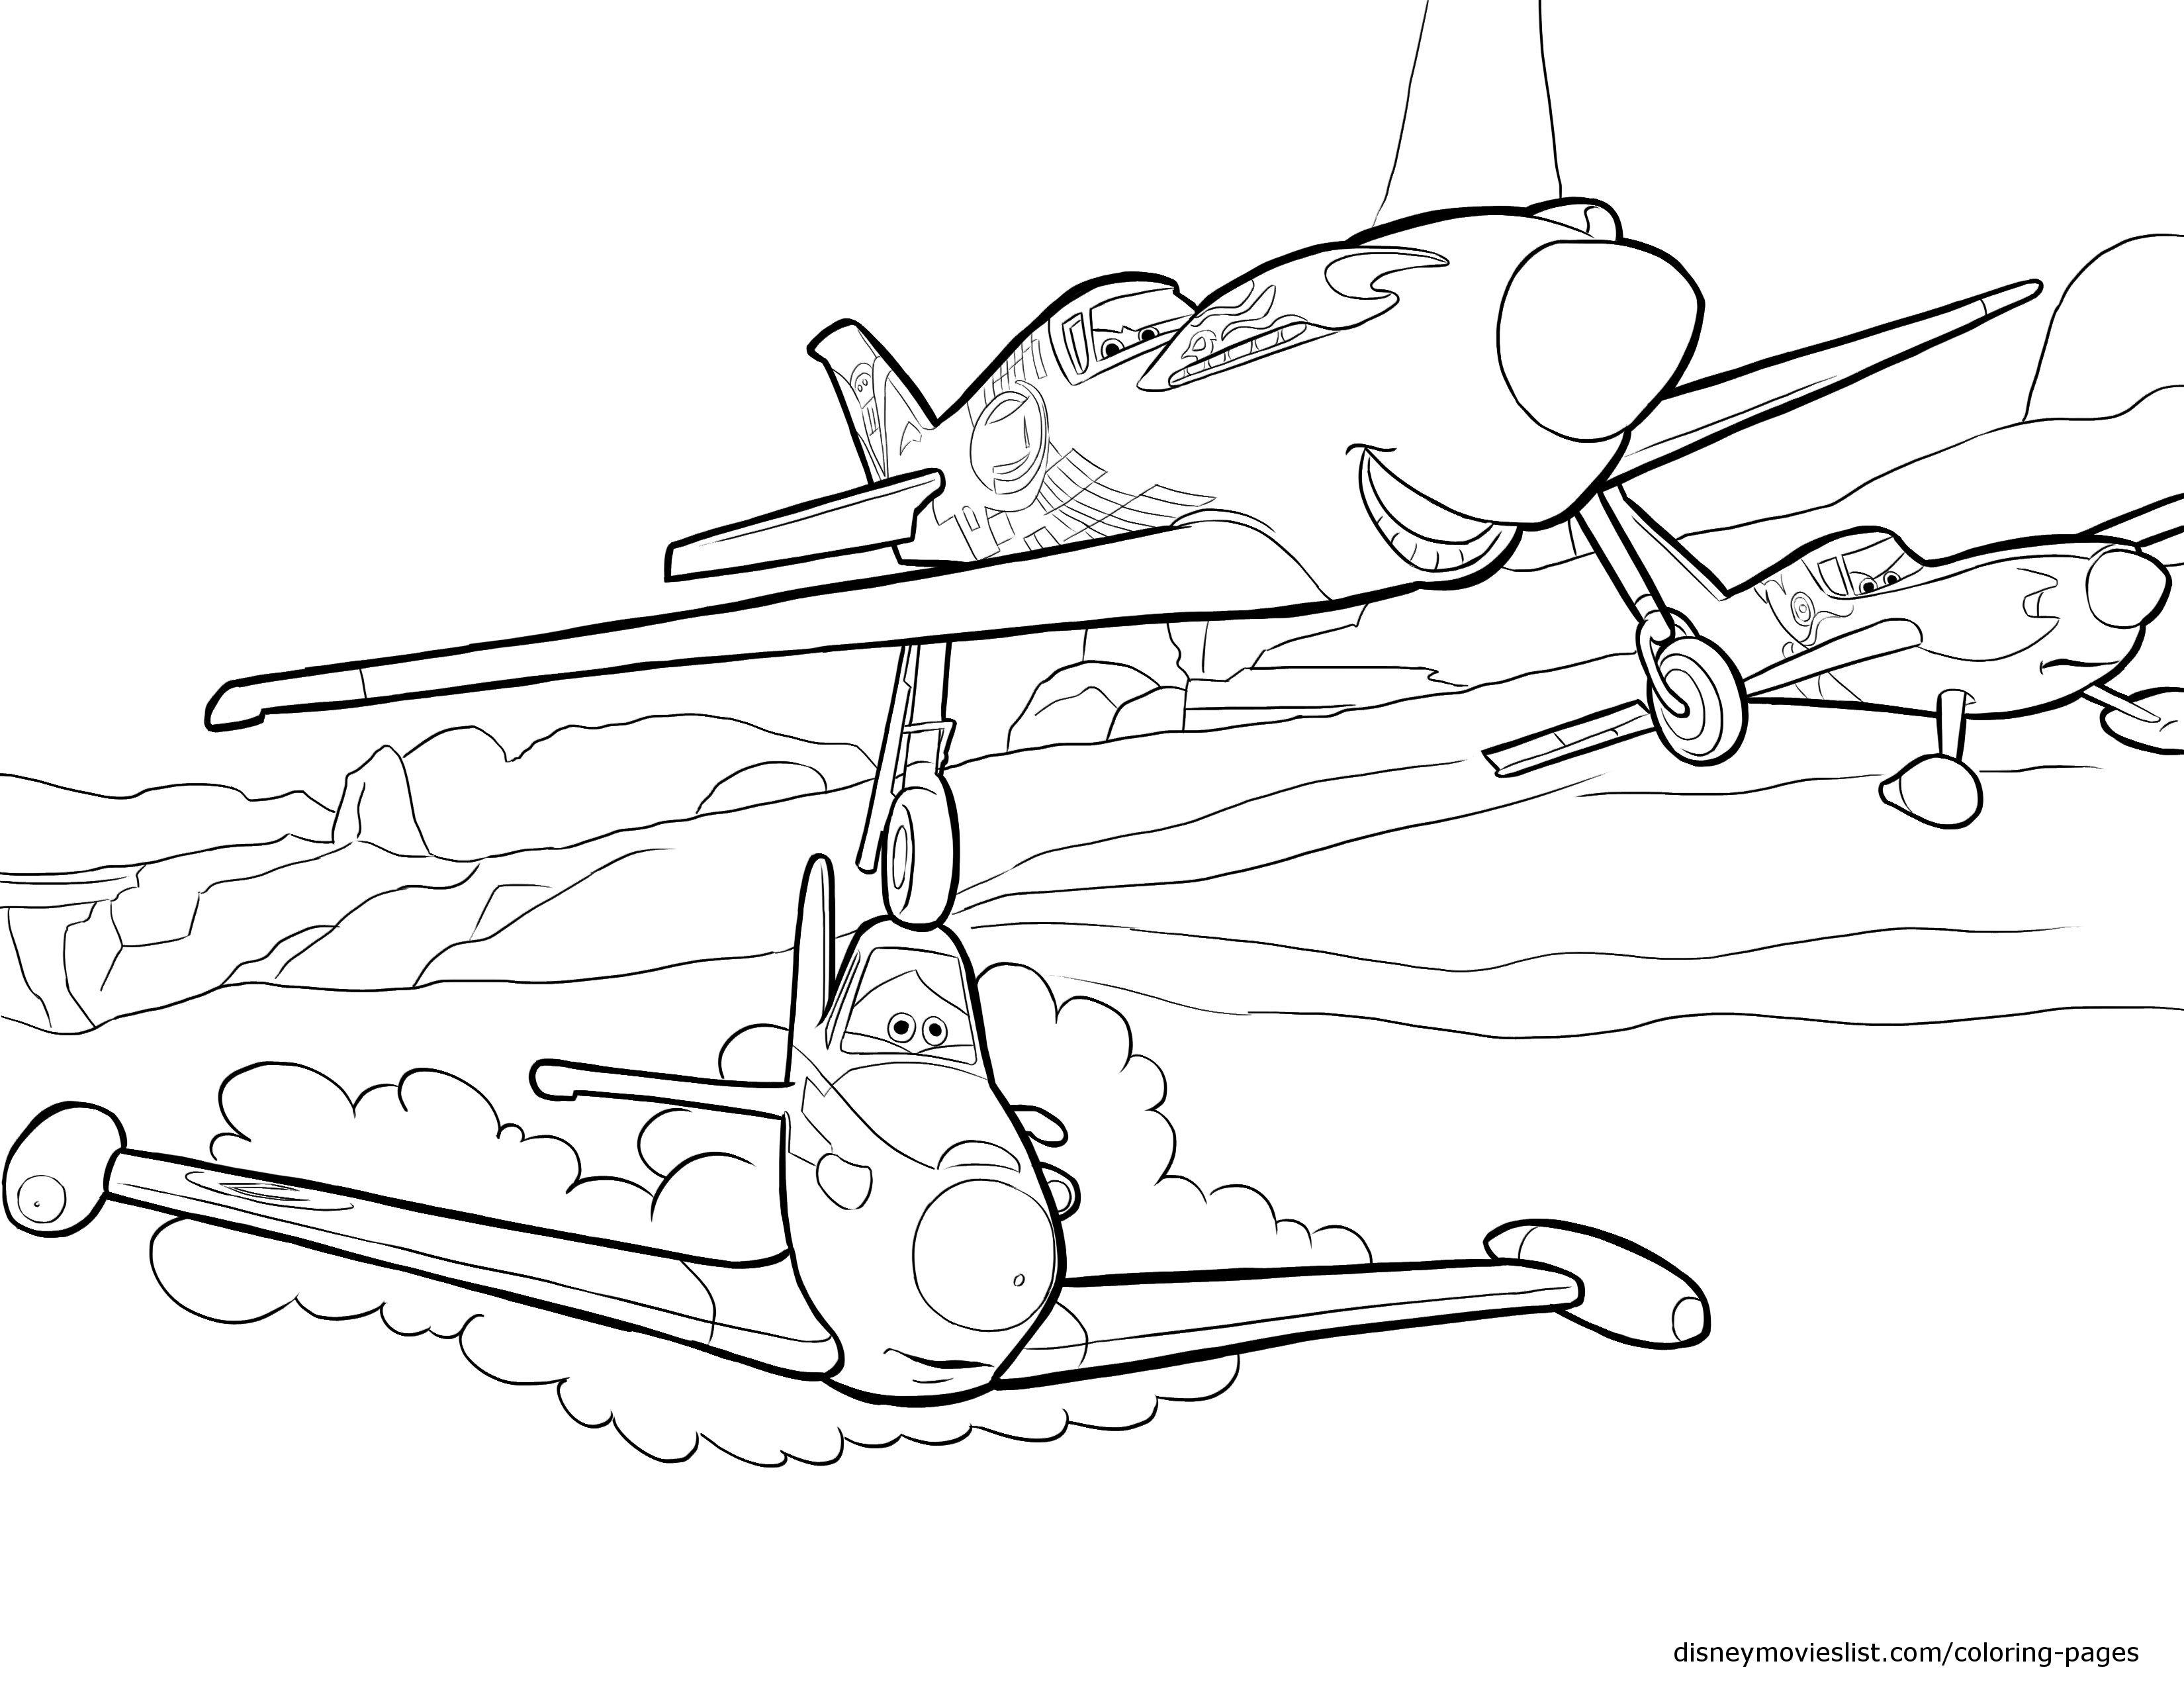 Drawn aircraft coloring page Disney Archives Page Disneys Printable